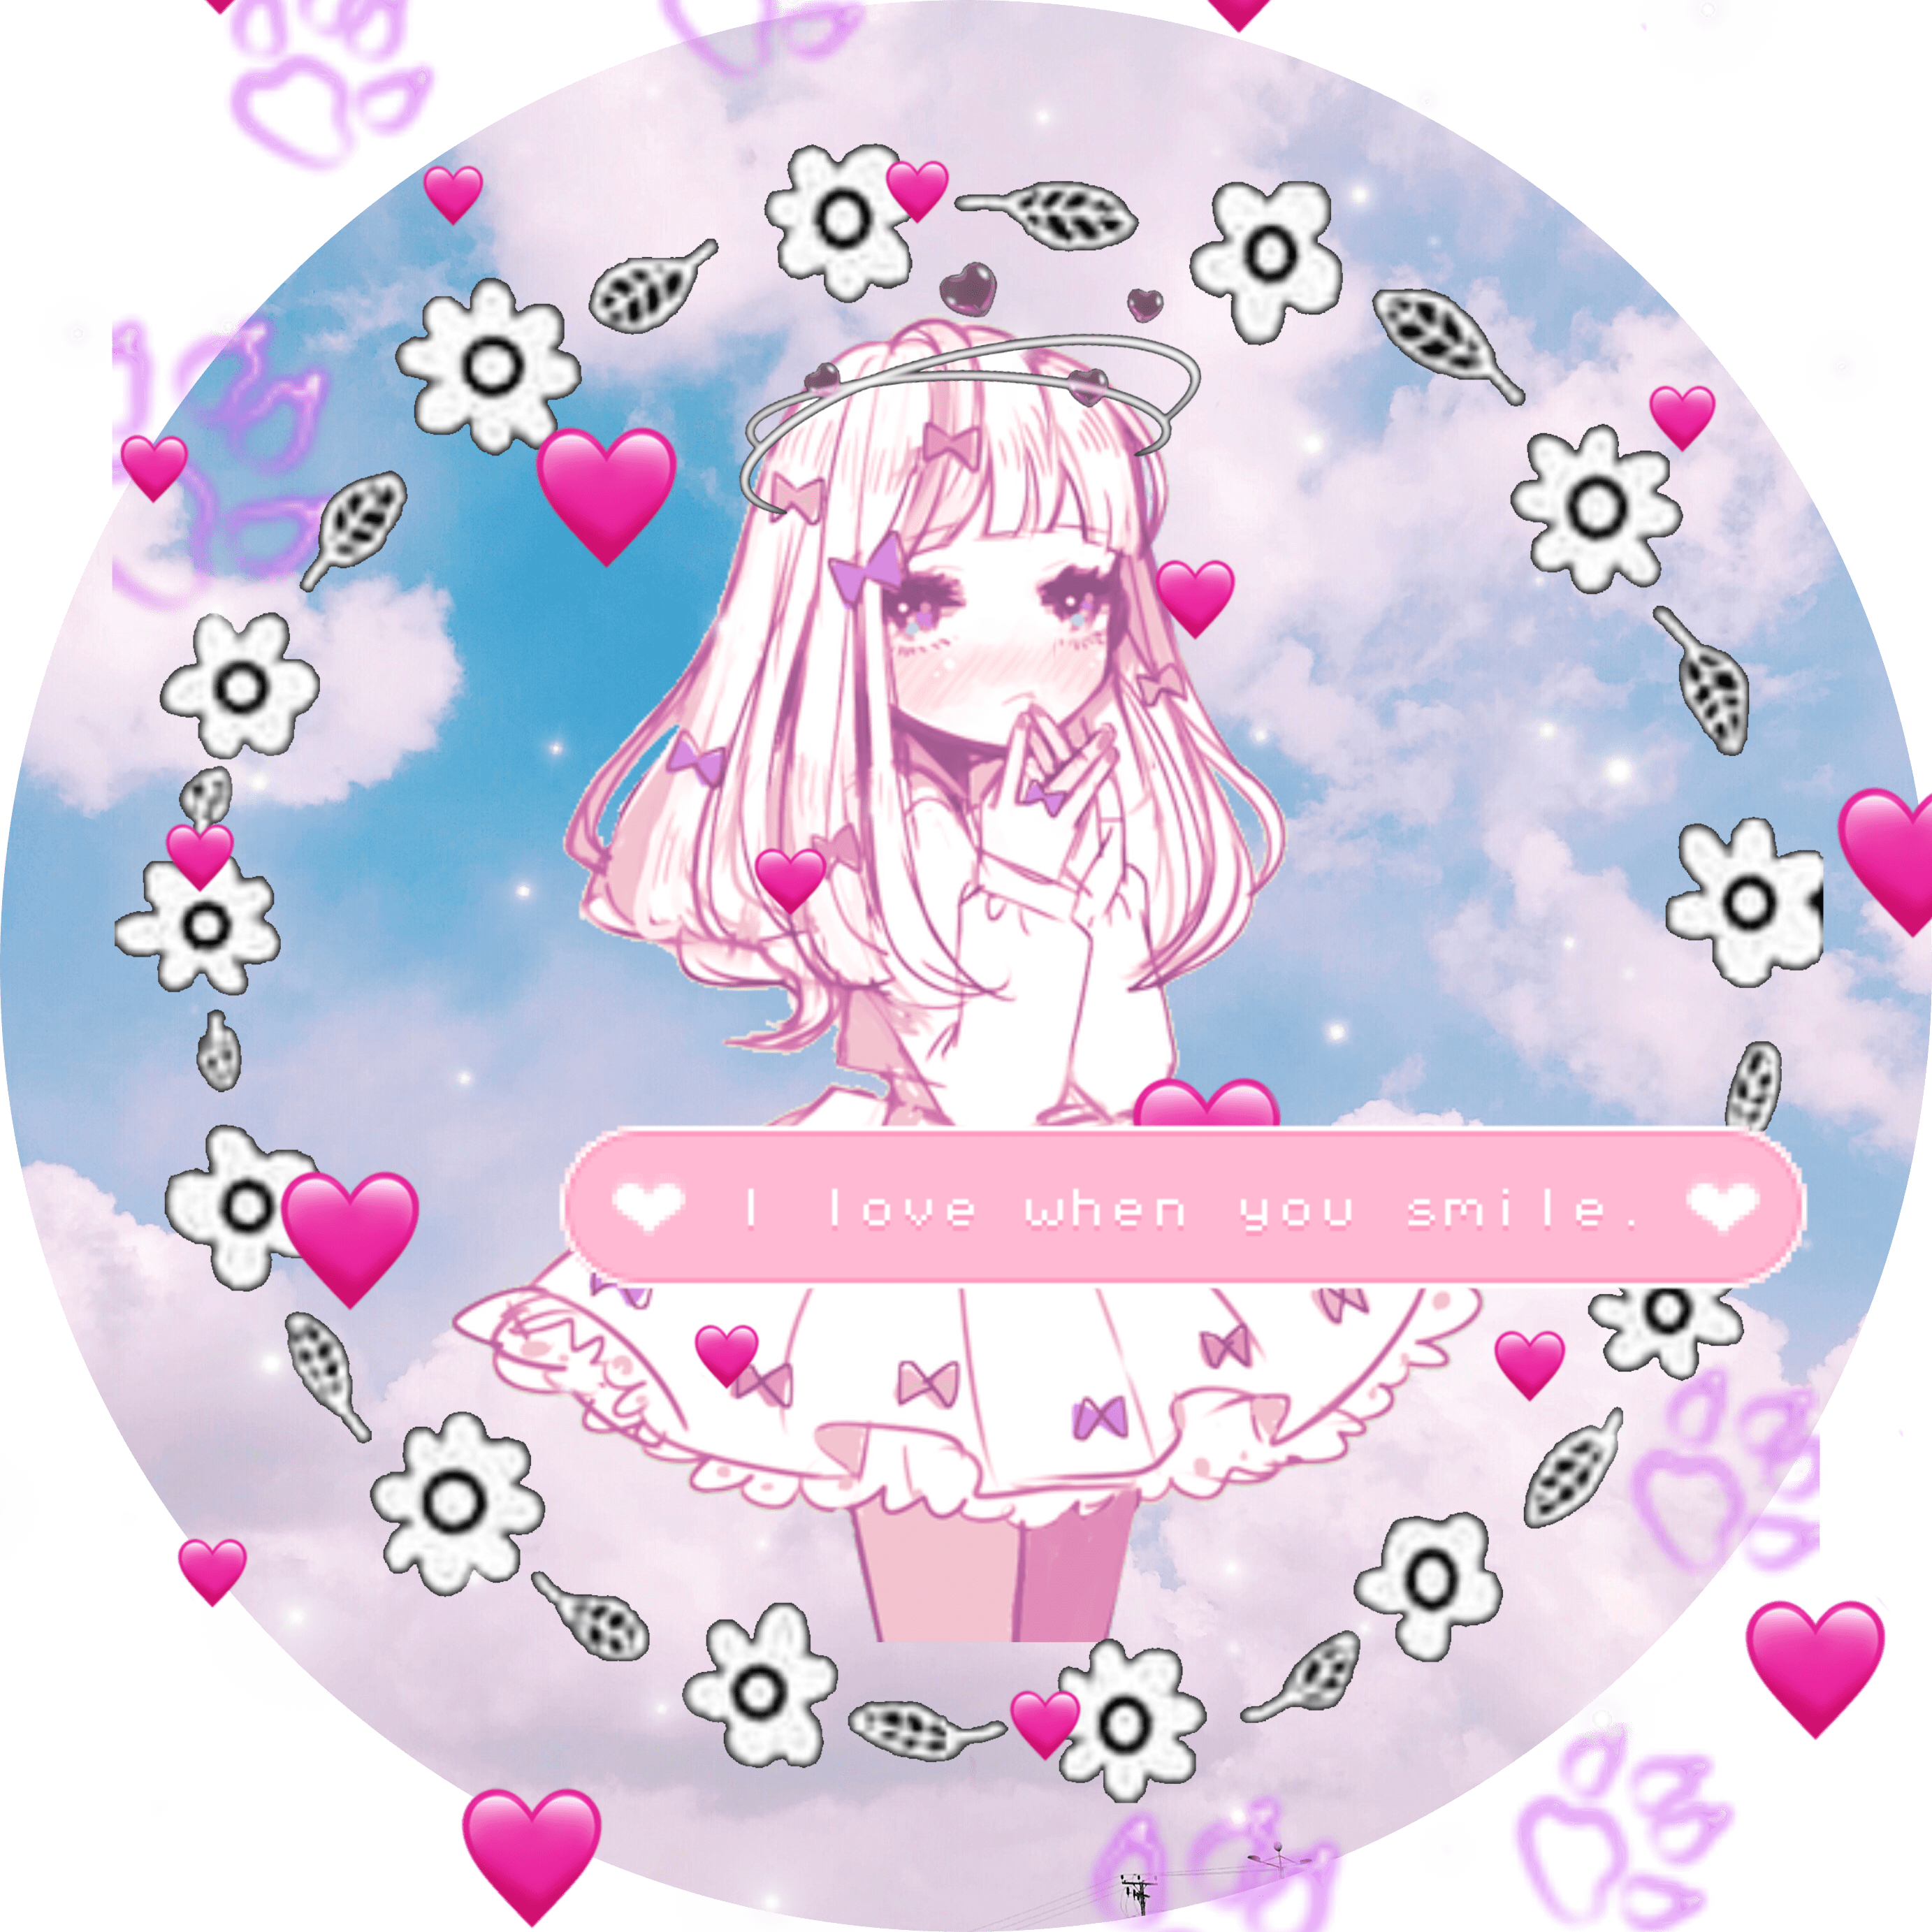 Aesthetic anime pfp boy smoking. pfp anime girl kawaii loli adorable cute hearts pawprin...